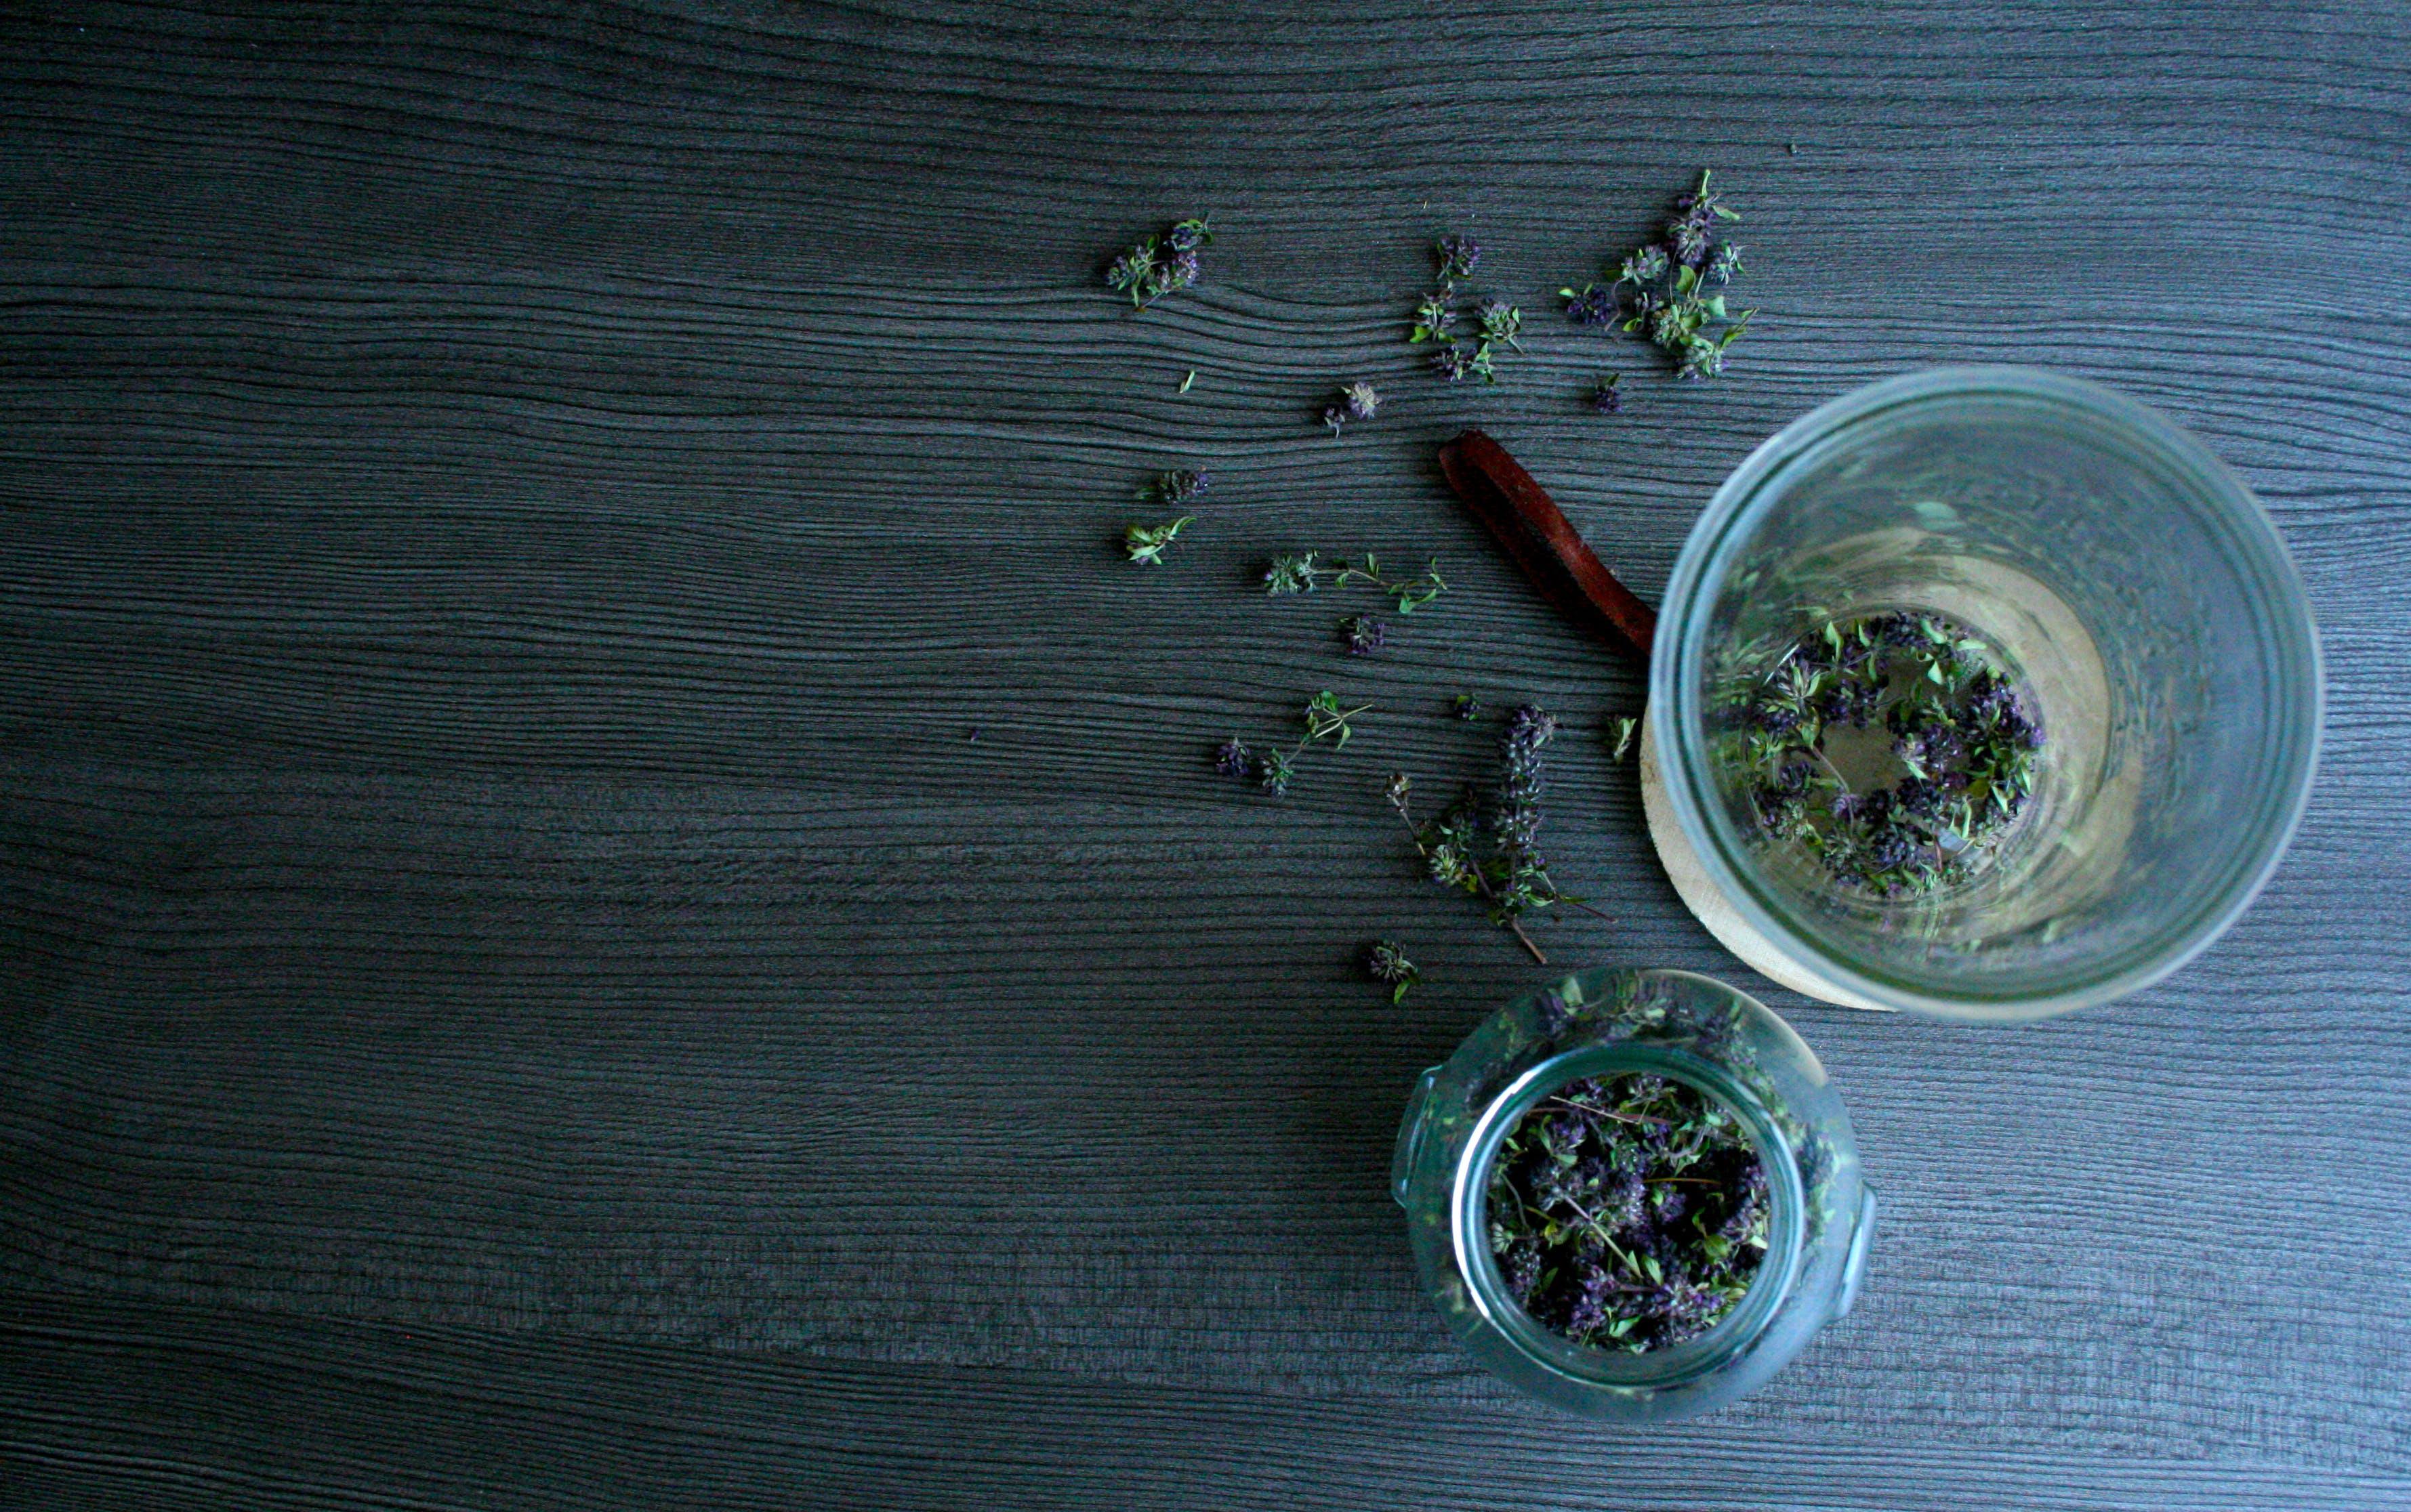 Free stock photo of chateau, herbal tea, herbs, medicinal herbs